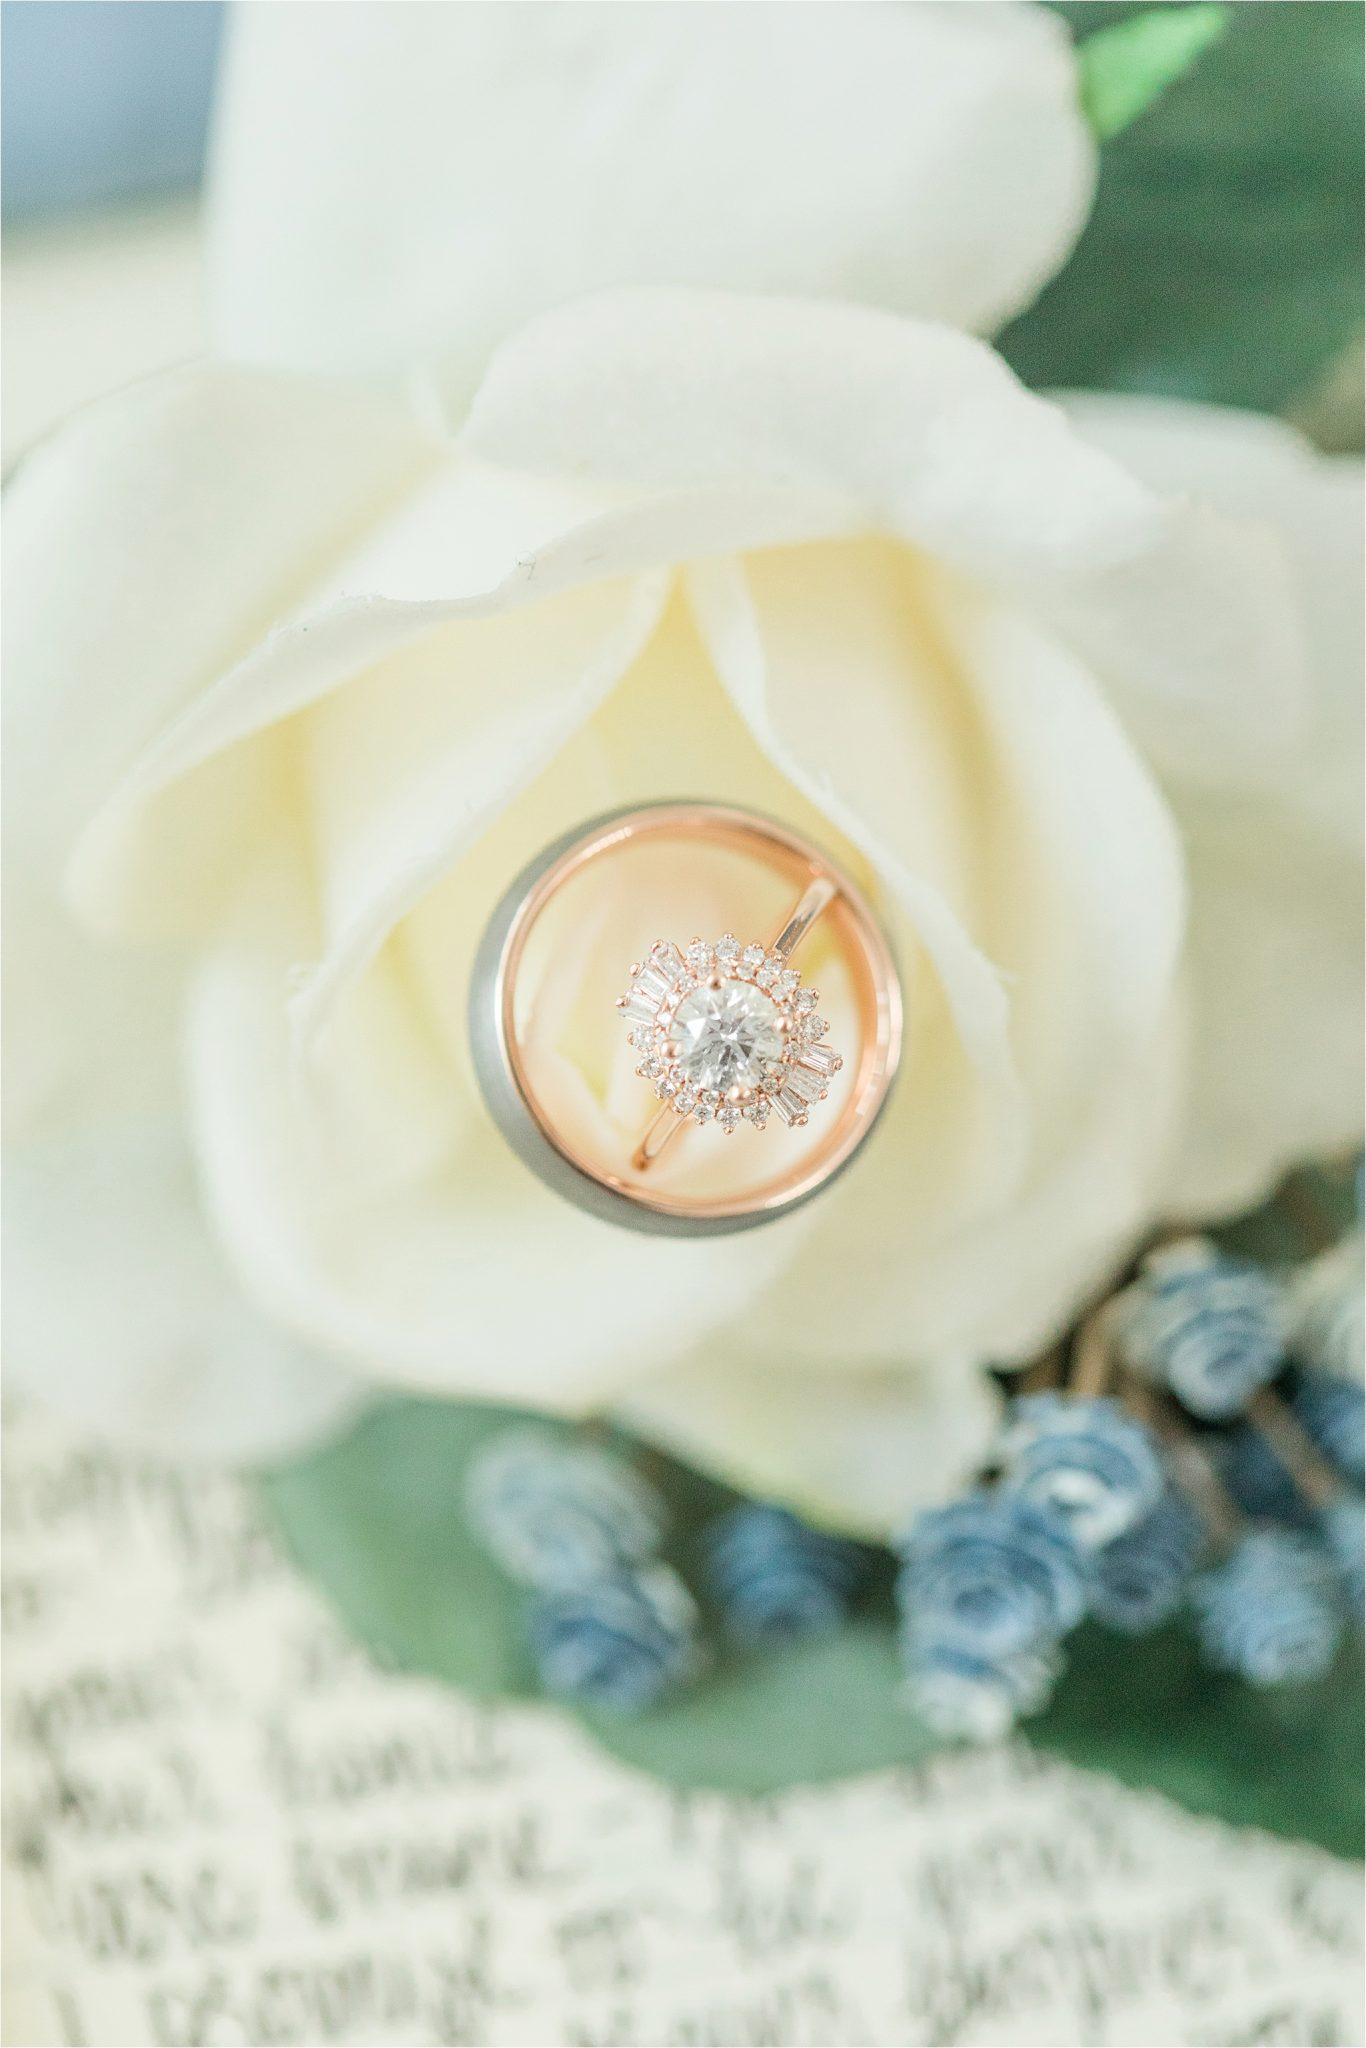 unique-engagement-ring-wedding-band-rose-gold-halo